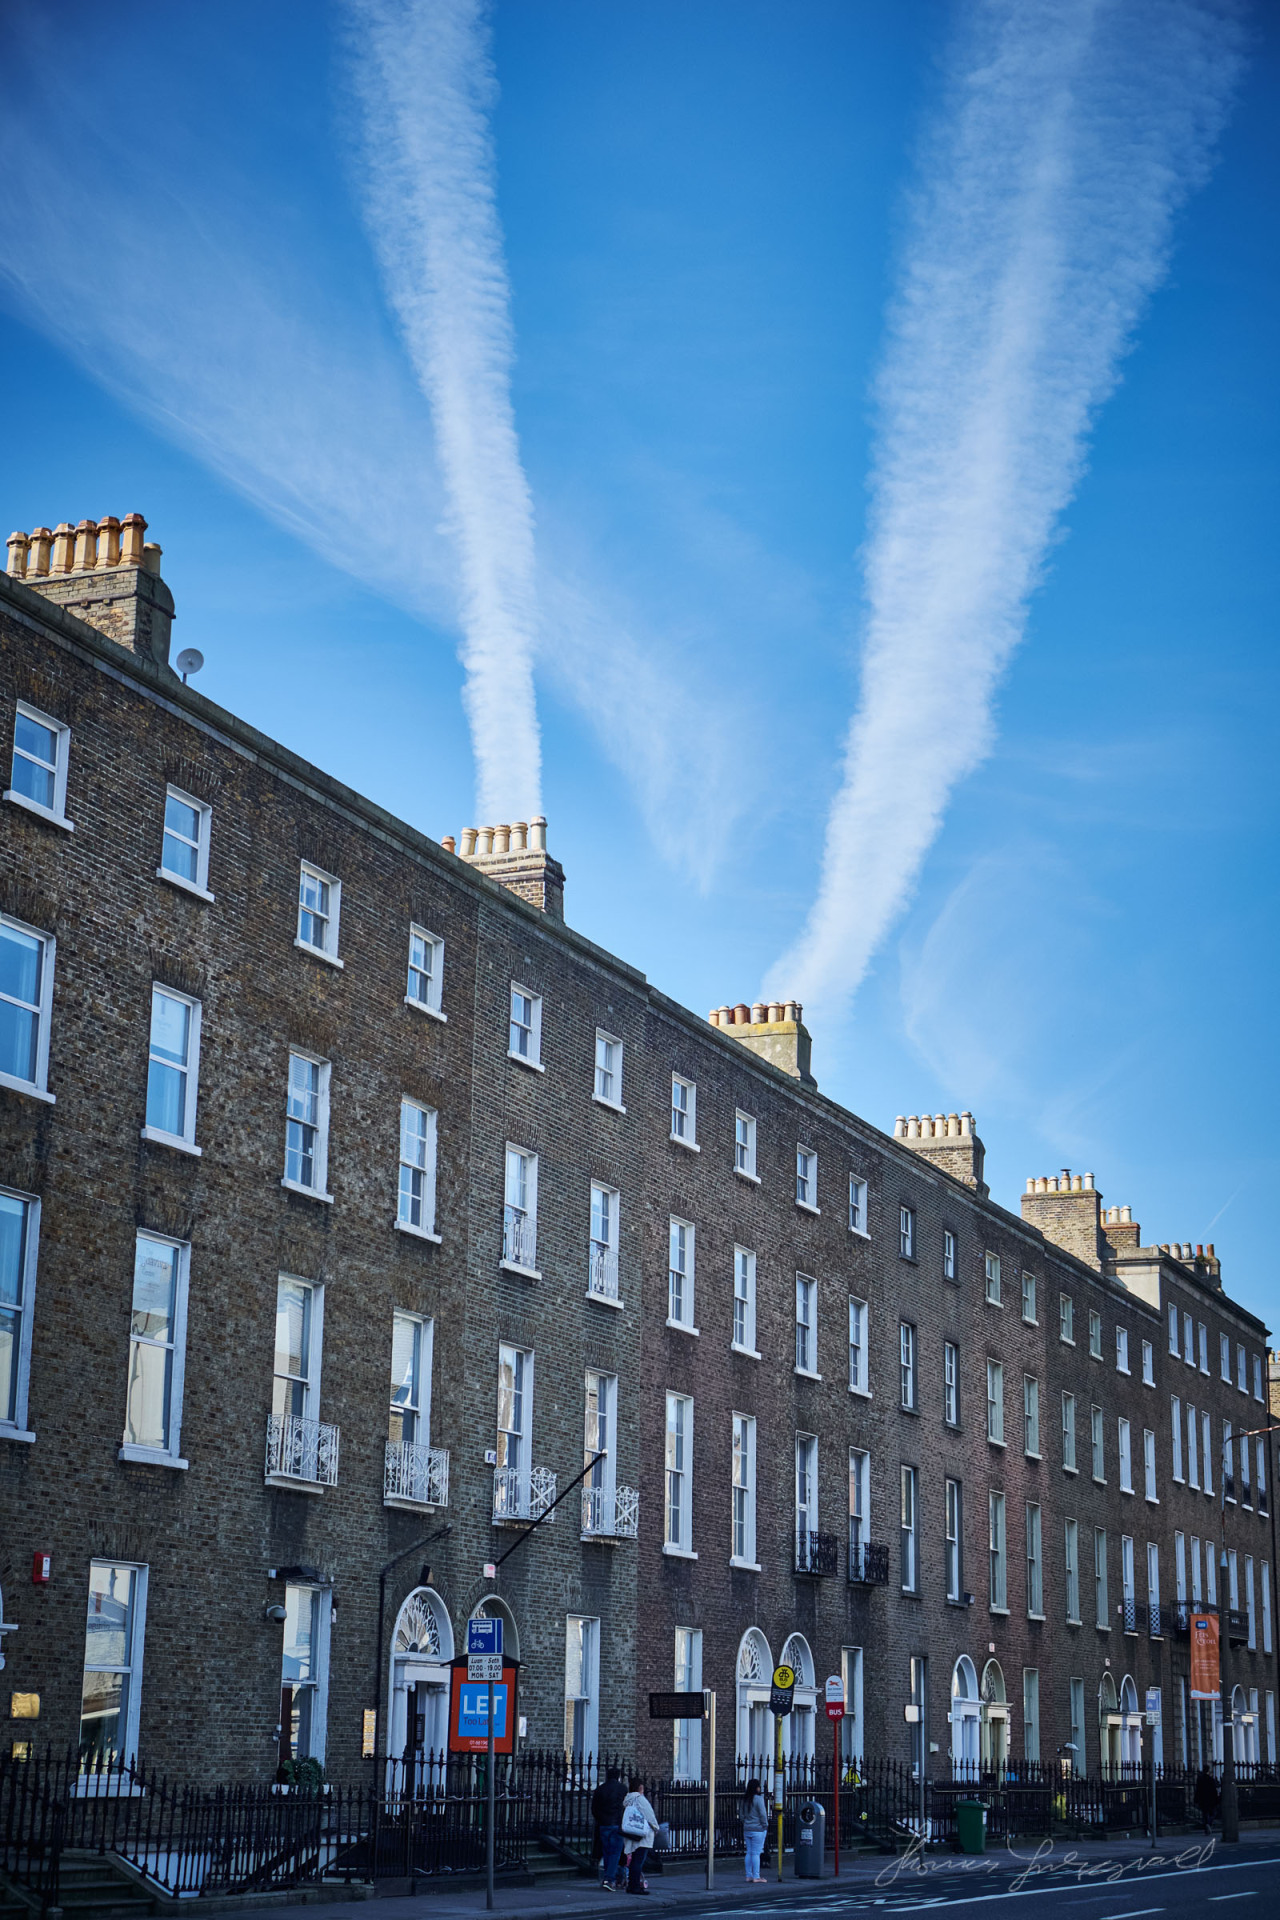 Blue sky over Leeson Street